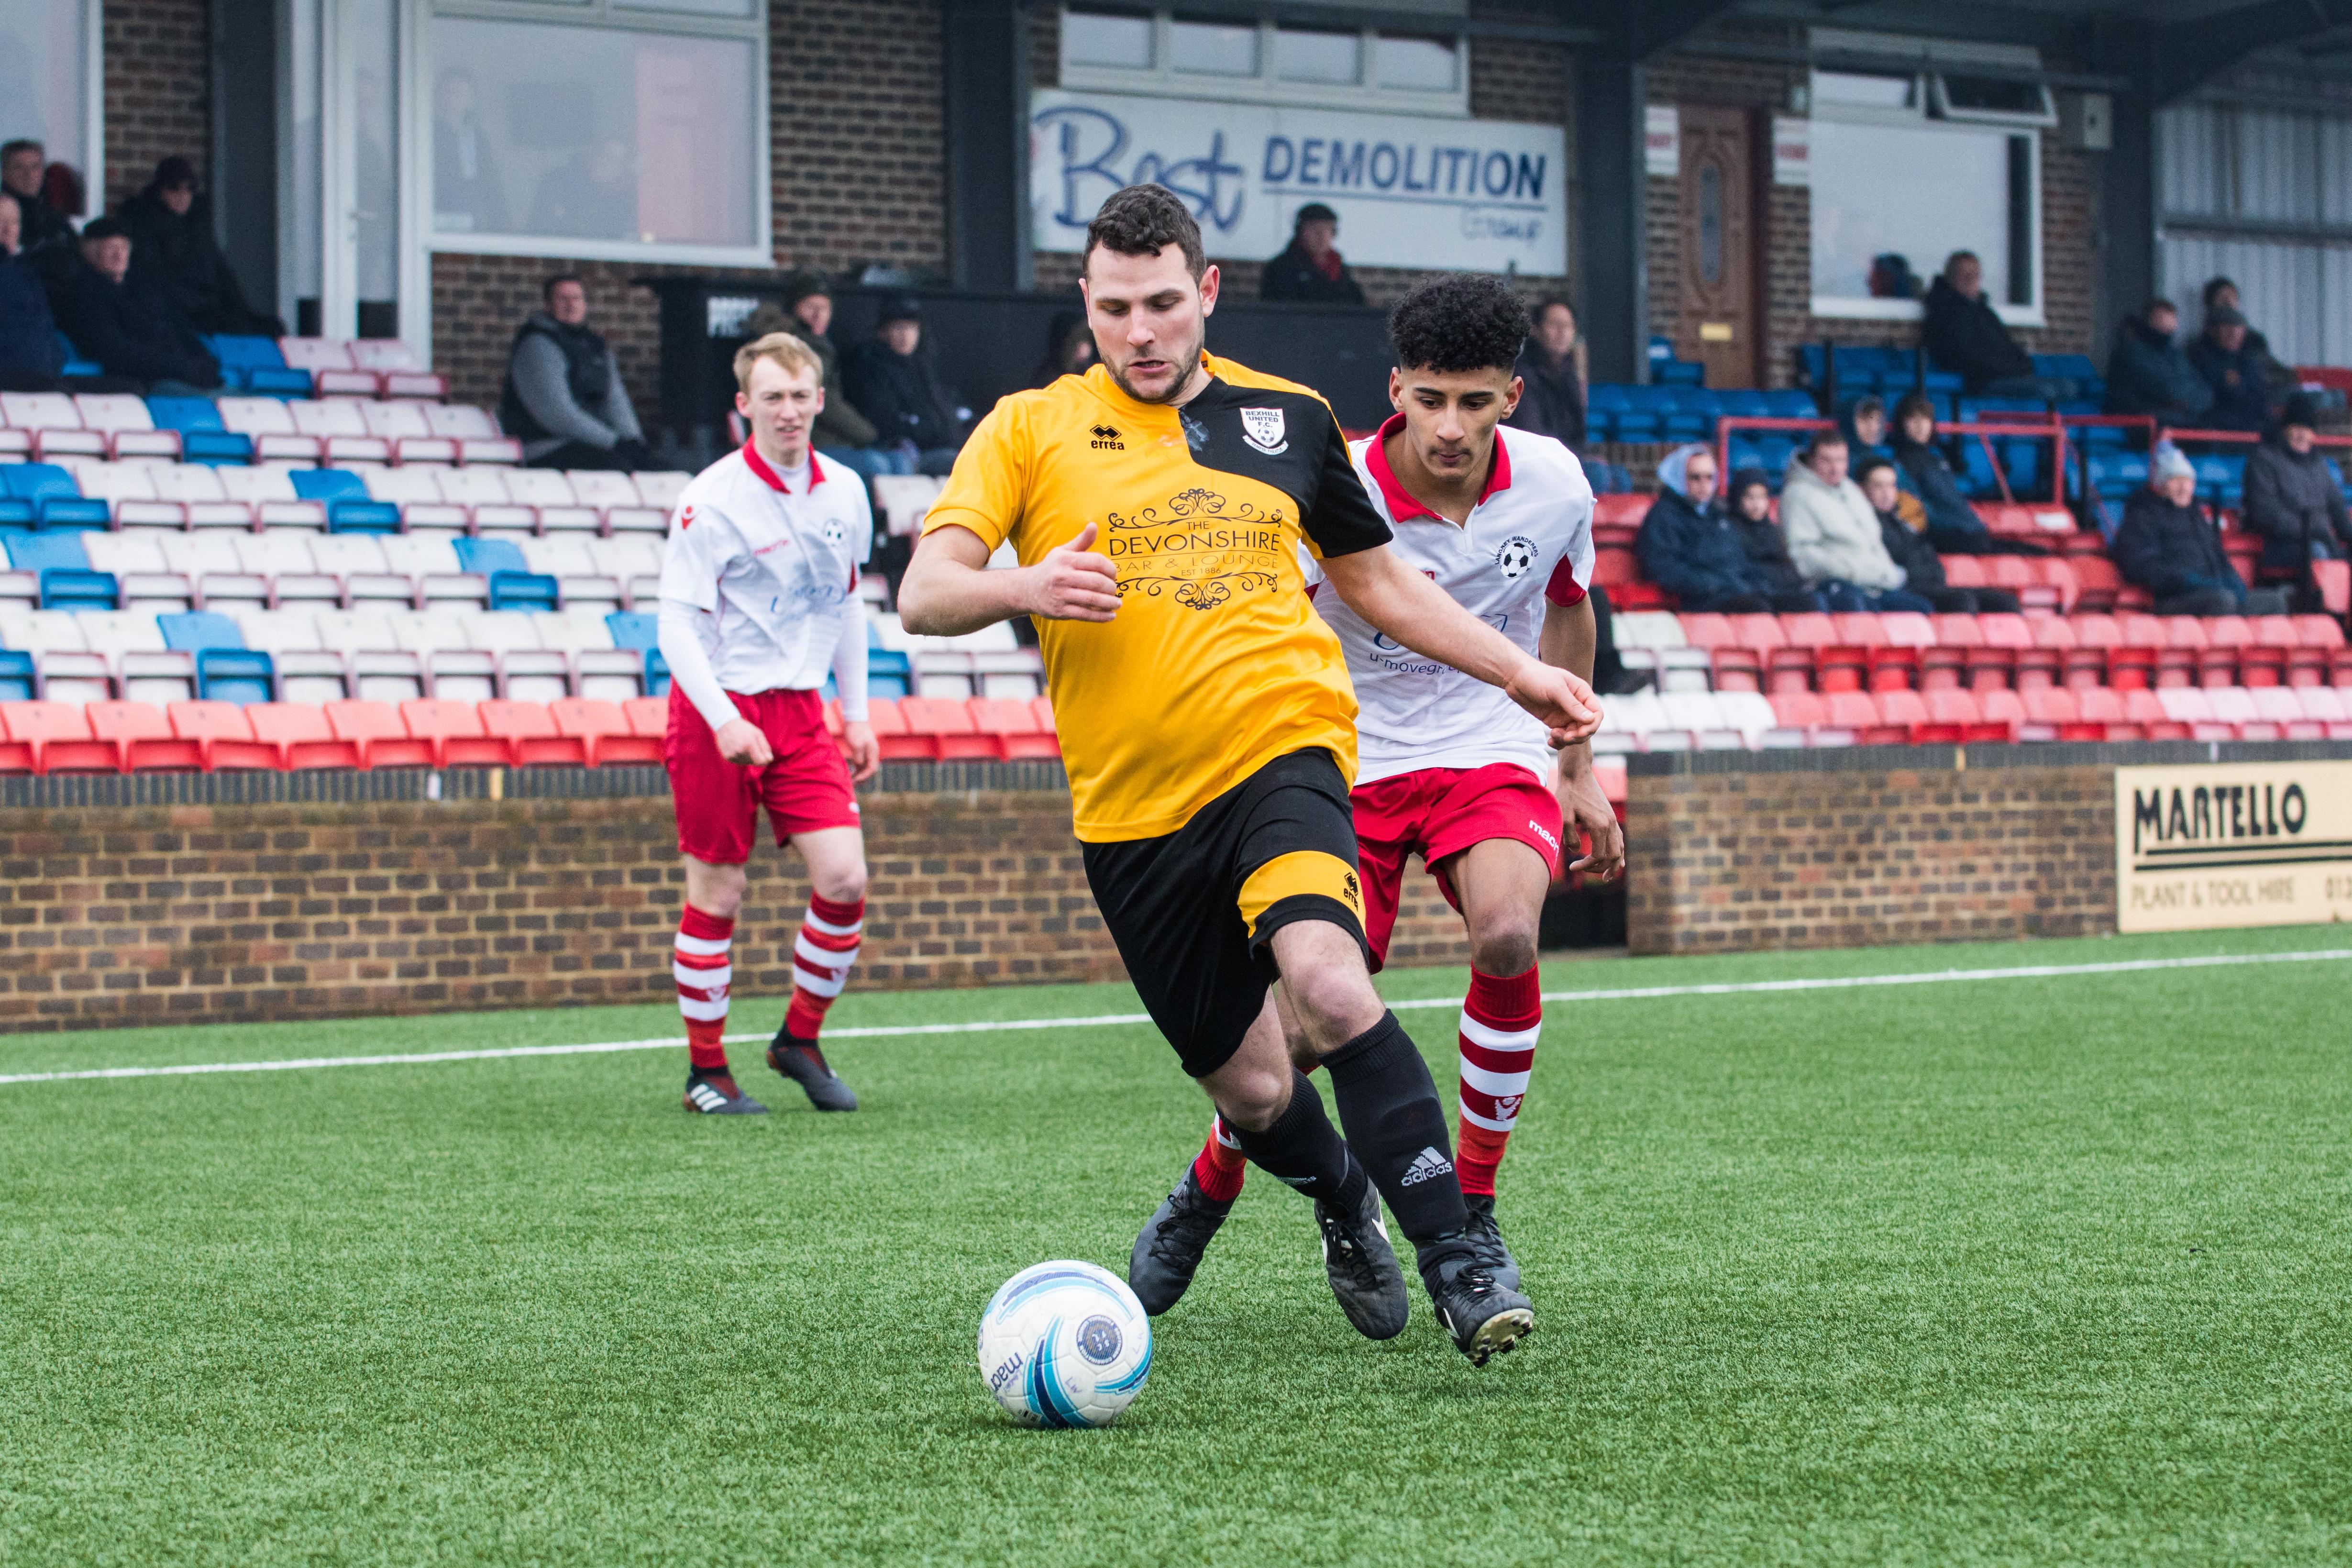 DAVID_JEFFERY Langney Wanderers FC vs Bexhill United FC 03.03.18 48